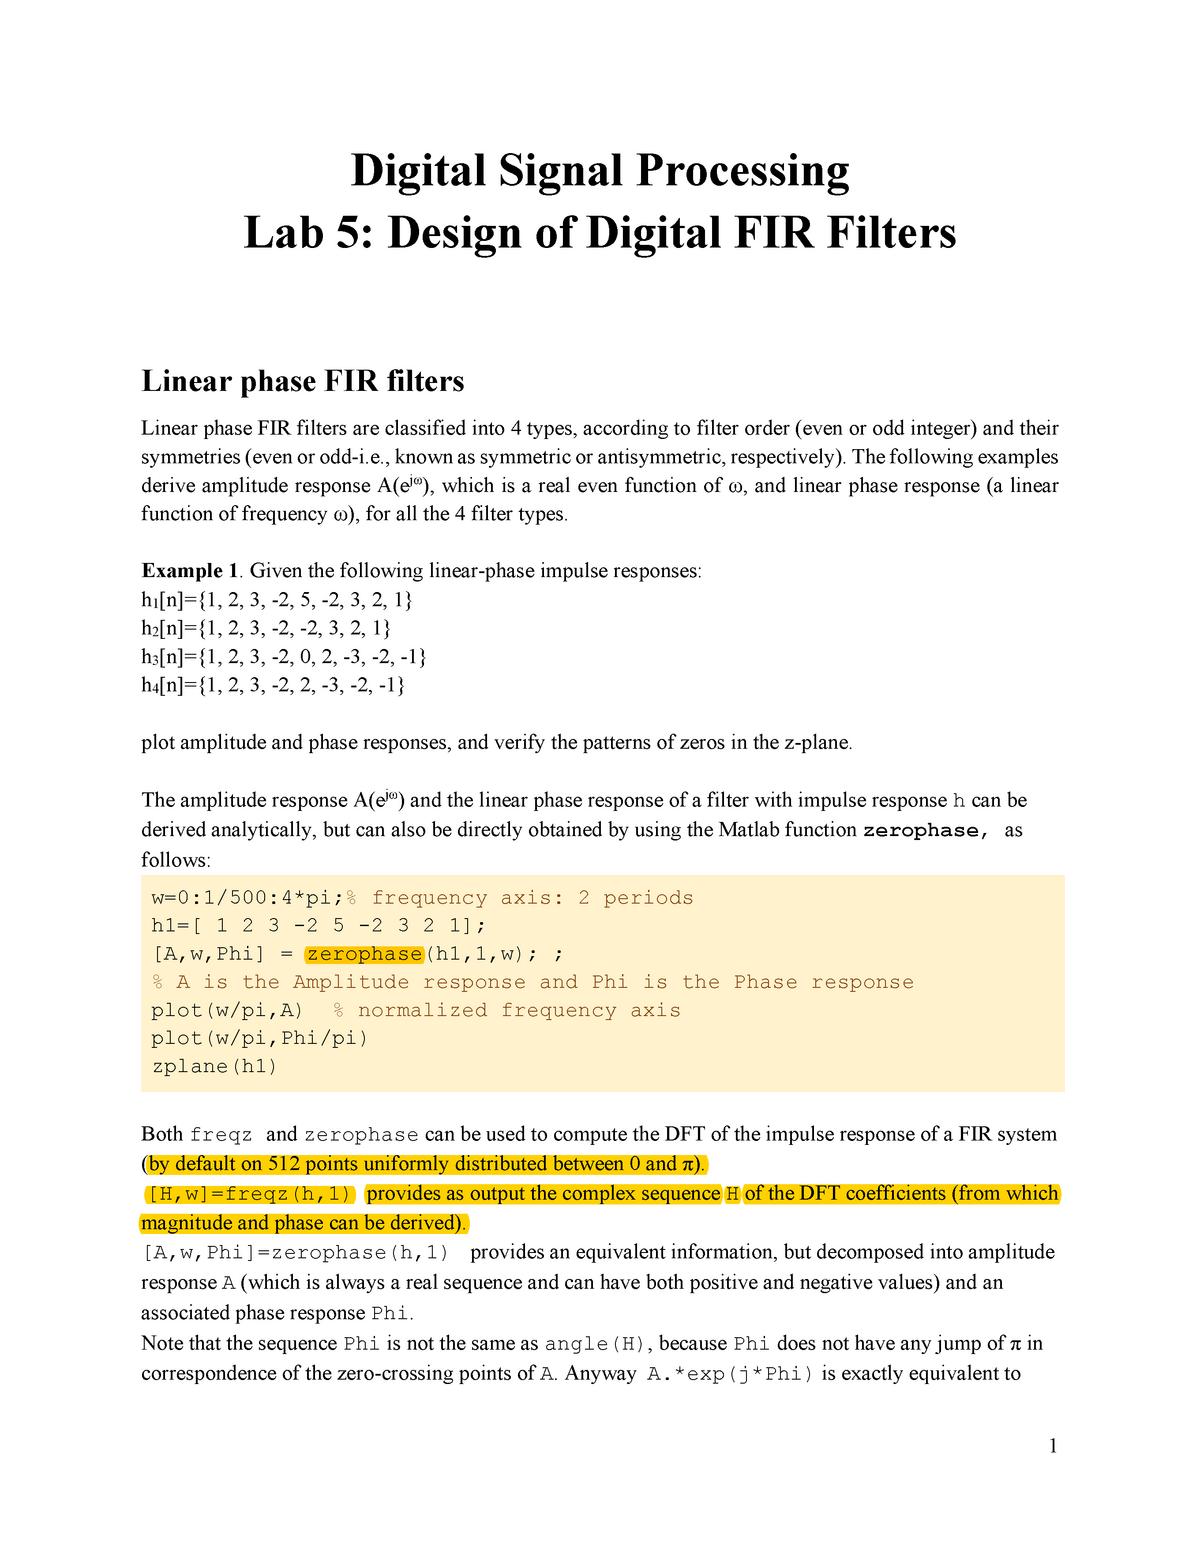 DSP Lab 5 FIR - lab - 140124: Digital signal processing